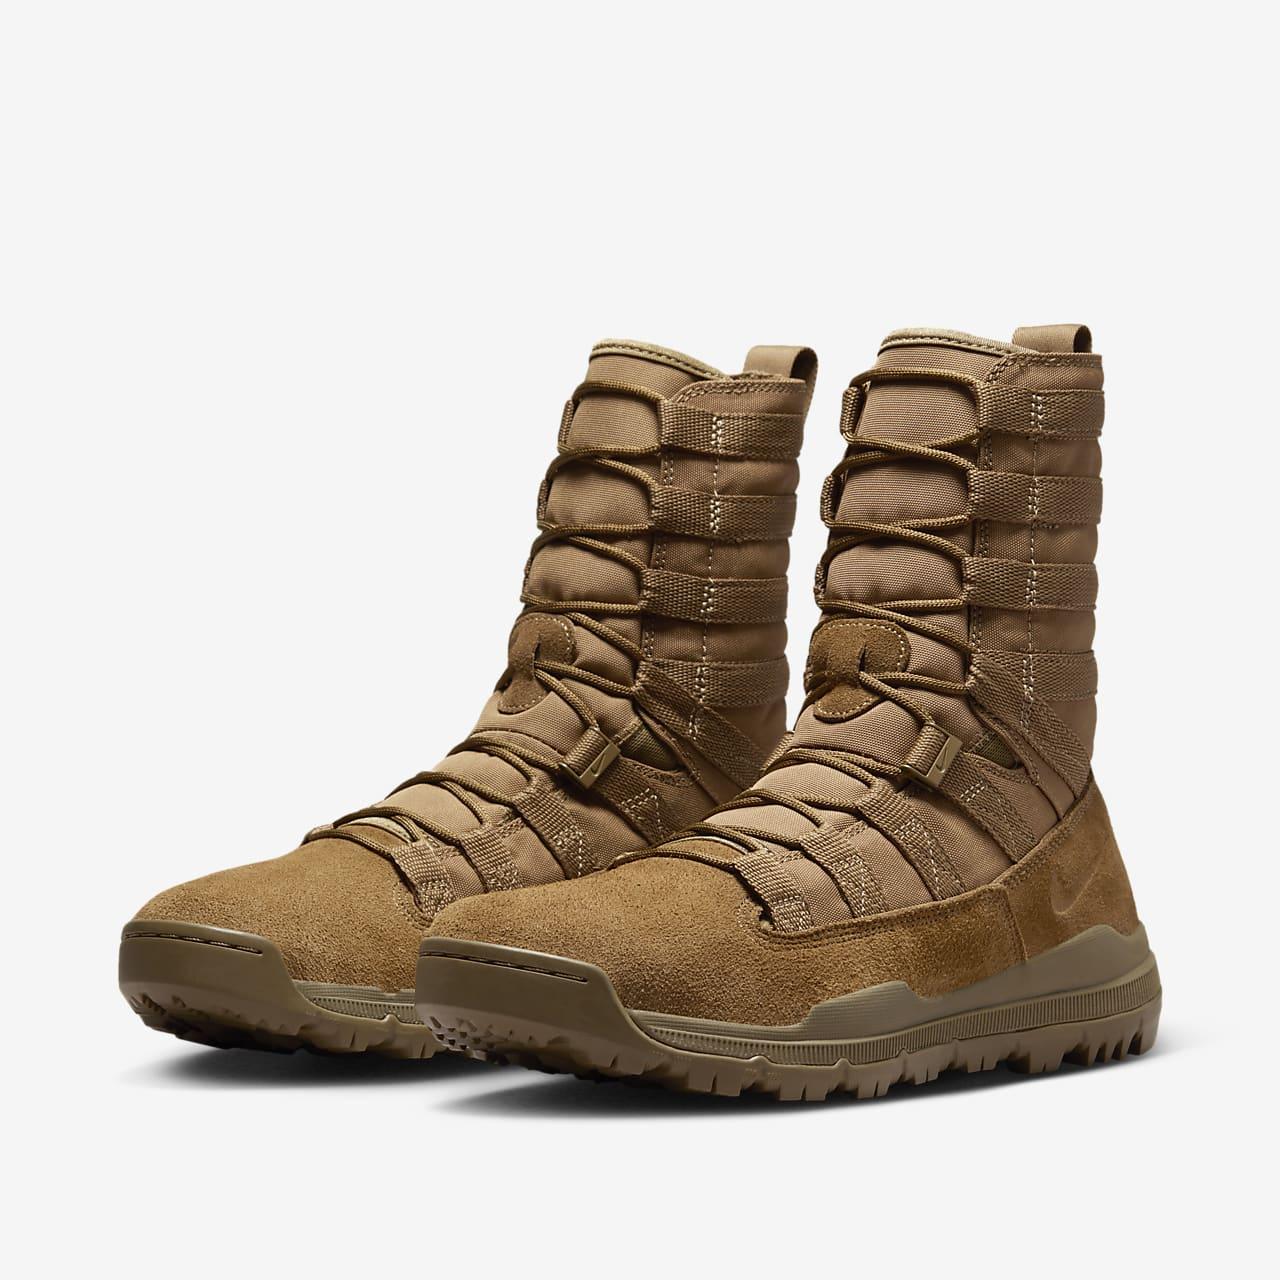 c573e3869 Nike SFB Gen 2 8